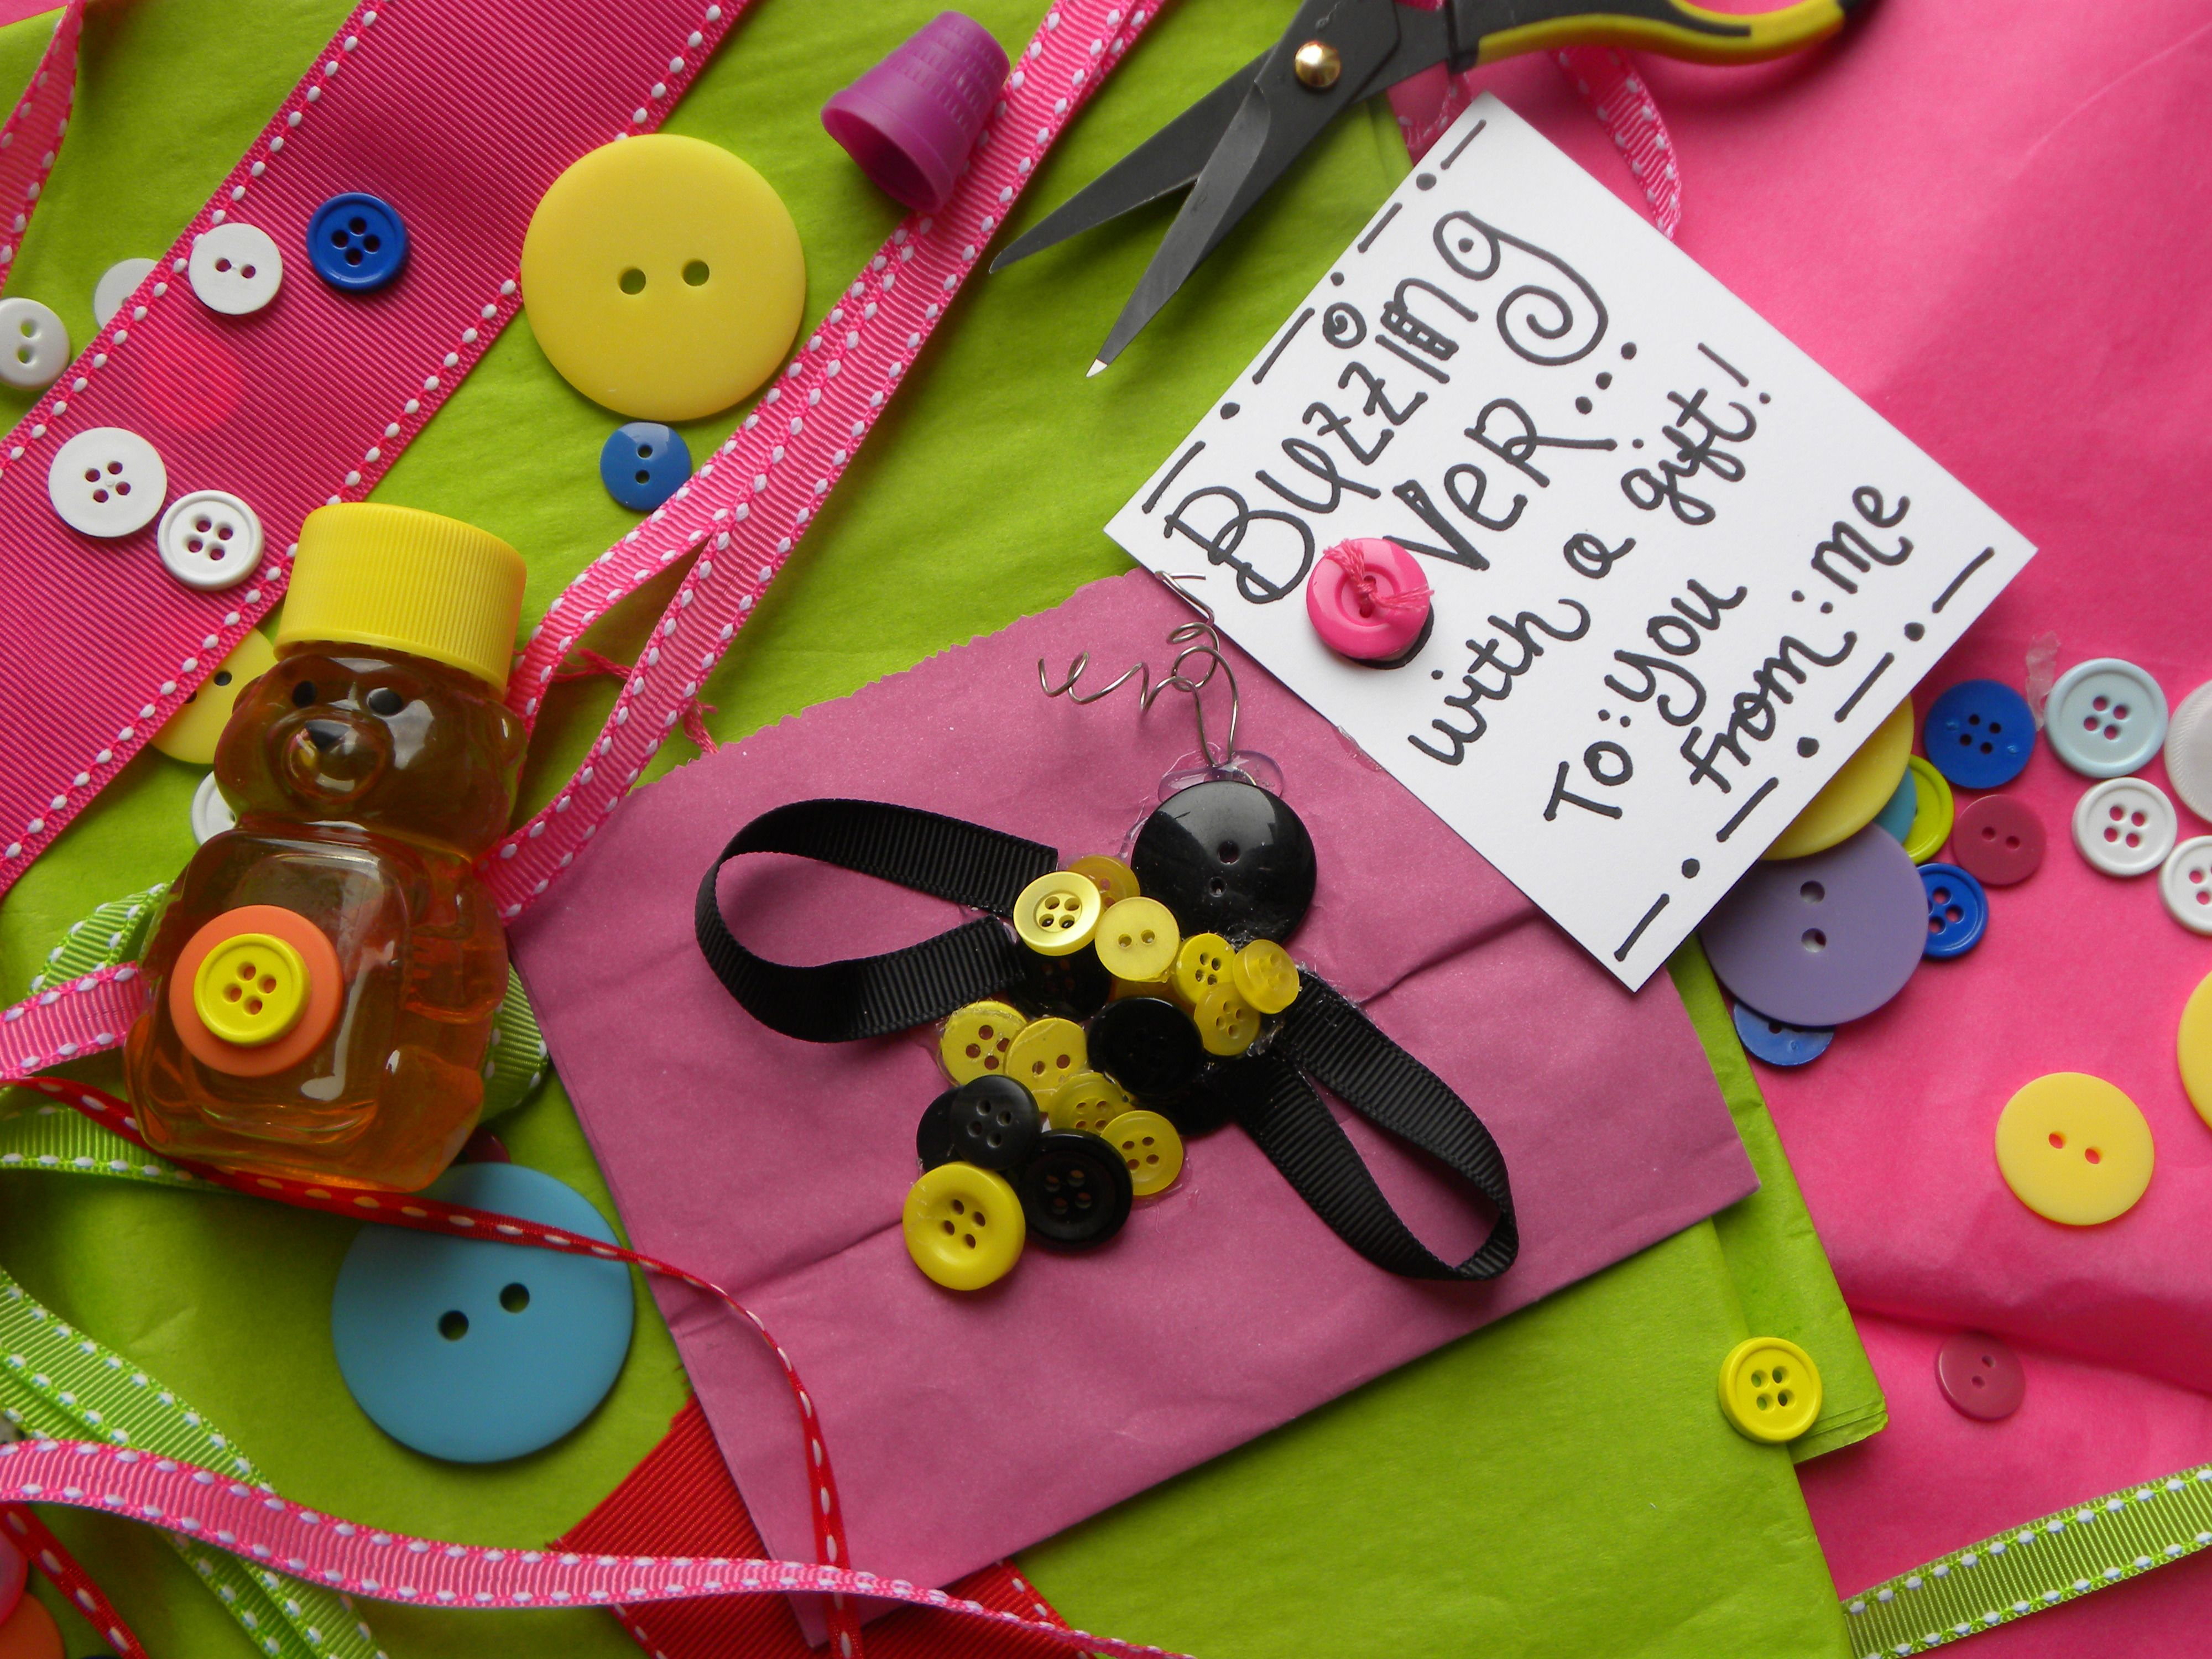 Craft bumble bee - Craft Bumble Bee Button Bumblebee